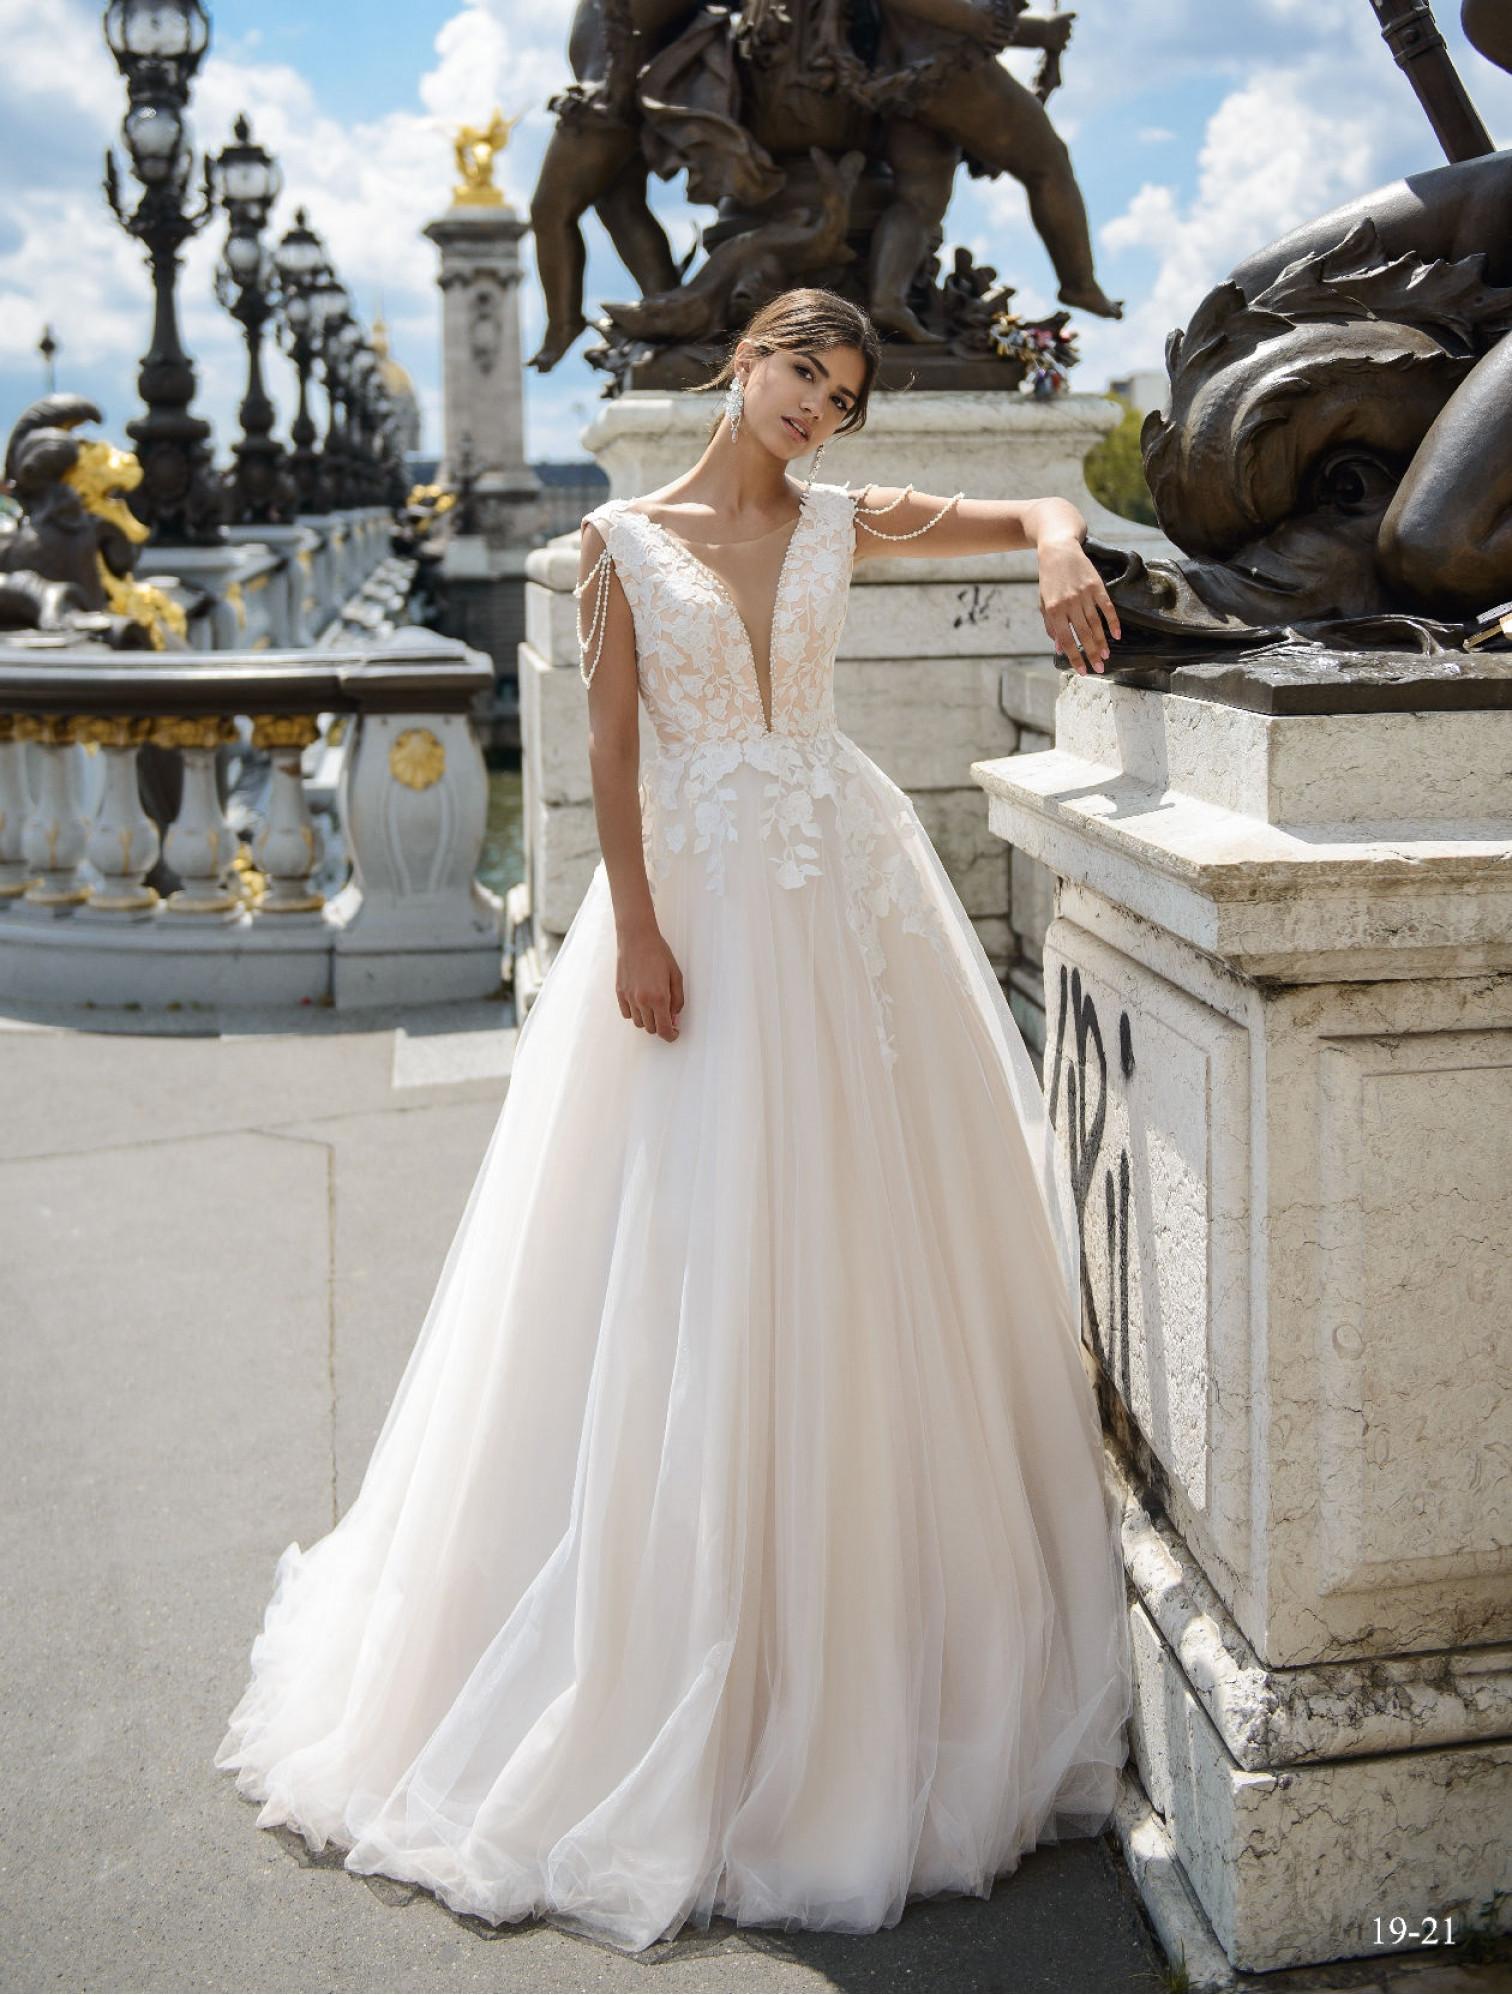 Wedding dress 19-21